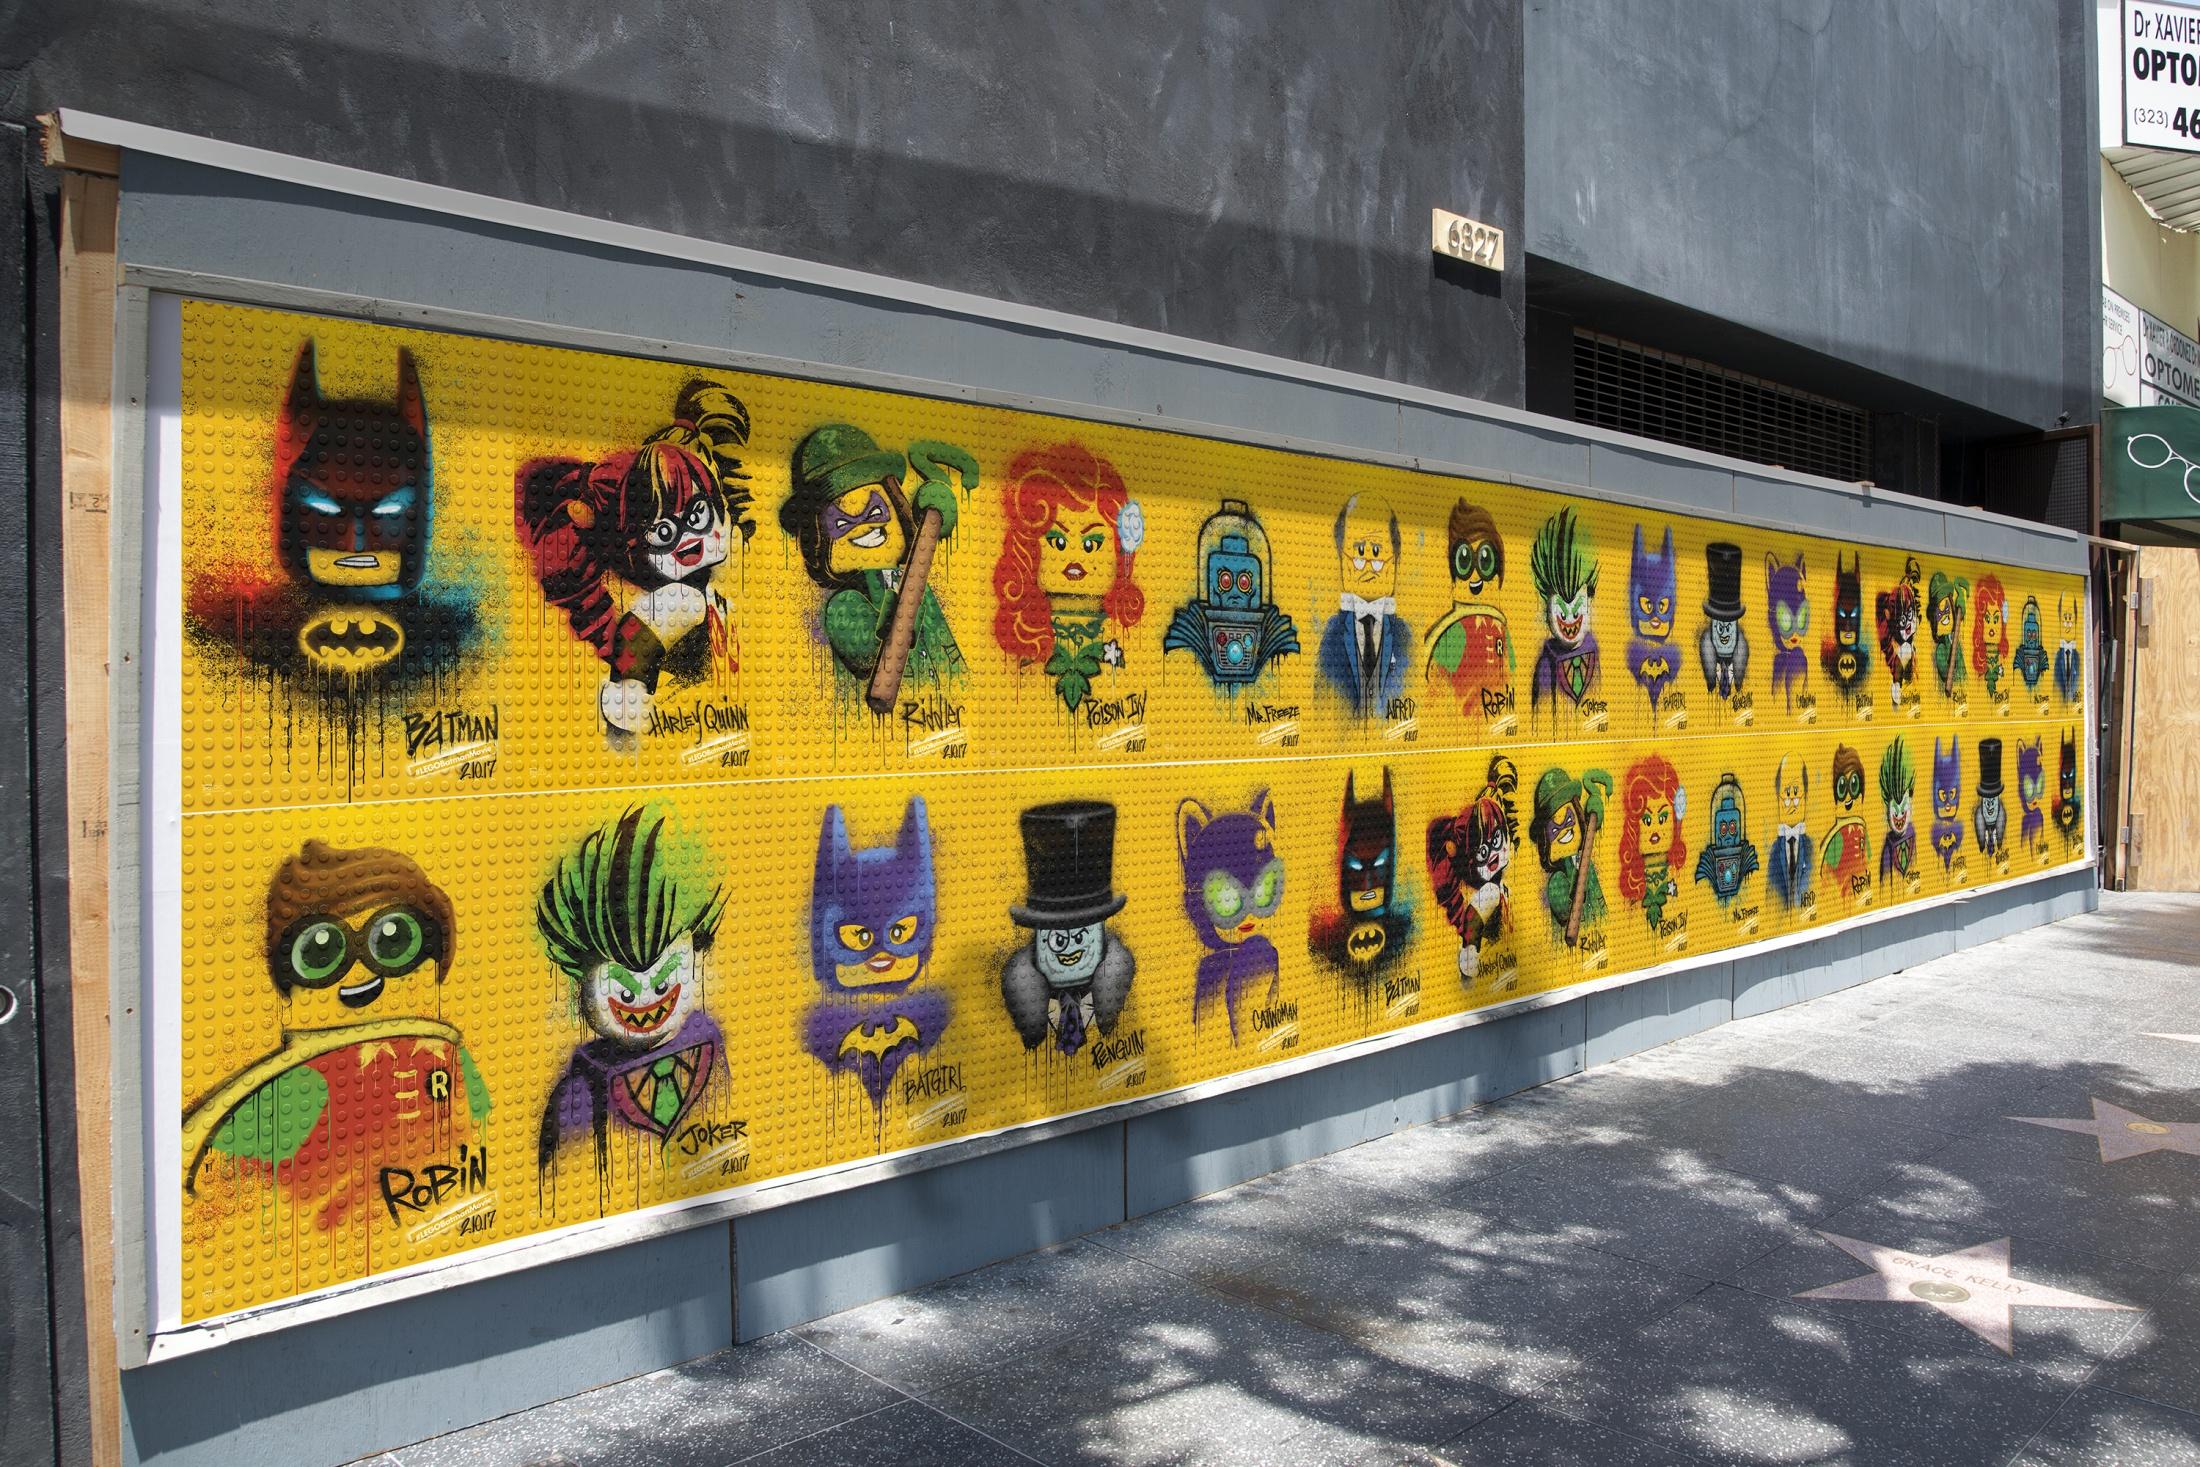 Thumbnail for The LEGO Batman Movie - Graffiti Wild Postings